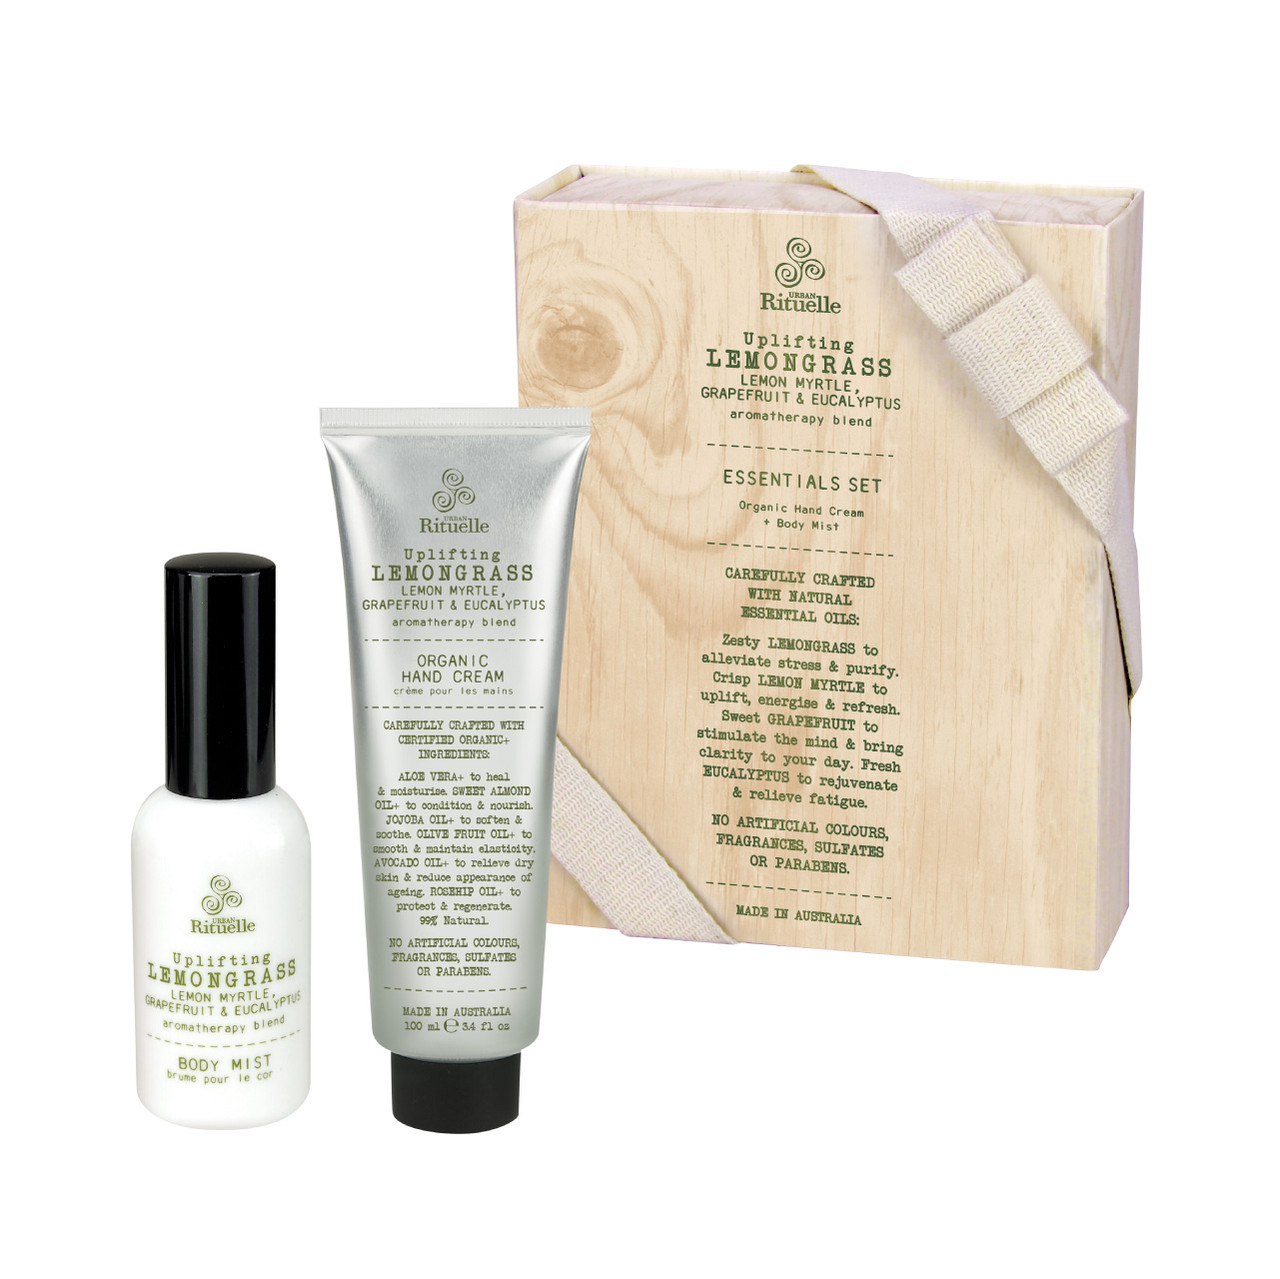 Flourish Organics - Essentials Set - Lemongrass - Urban Rituelle